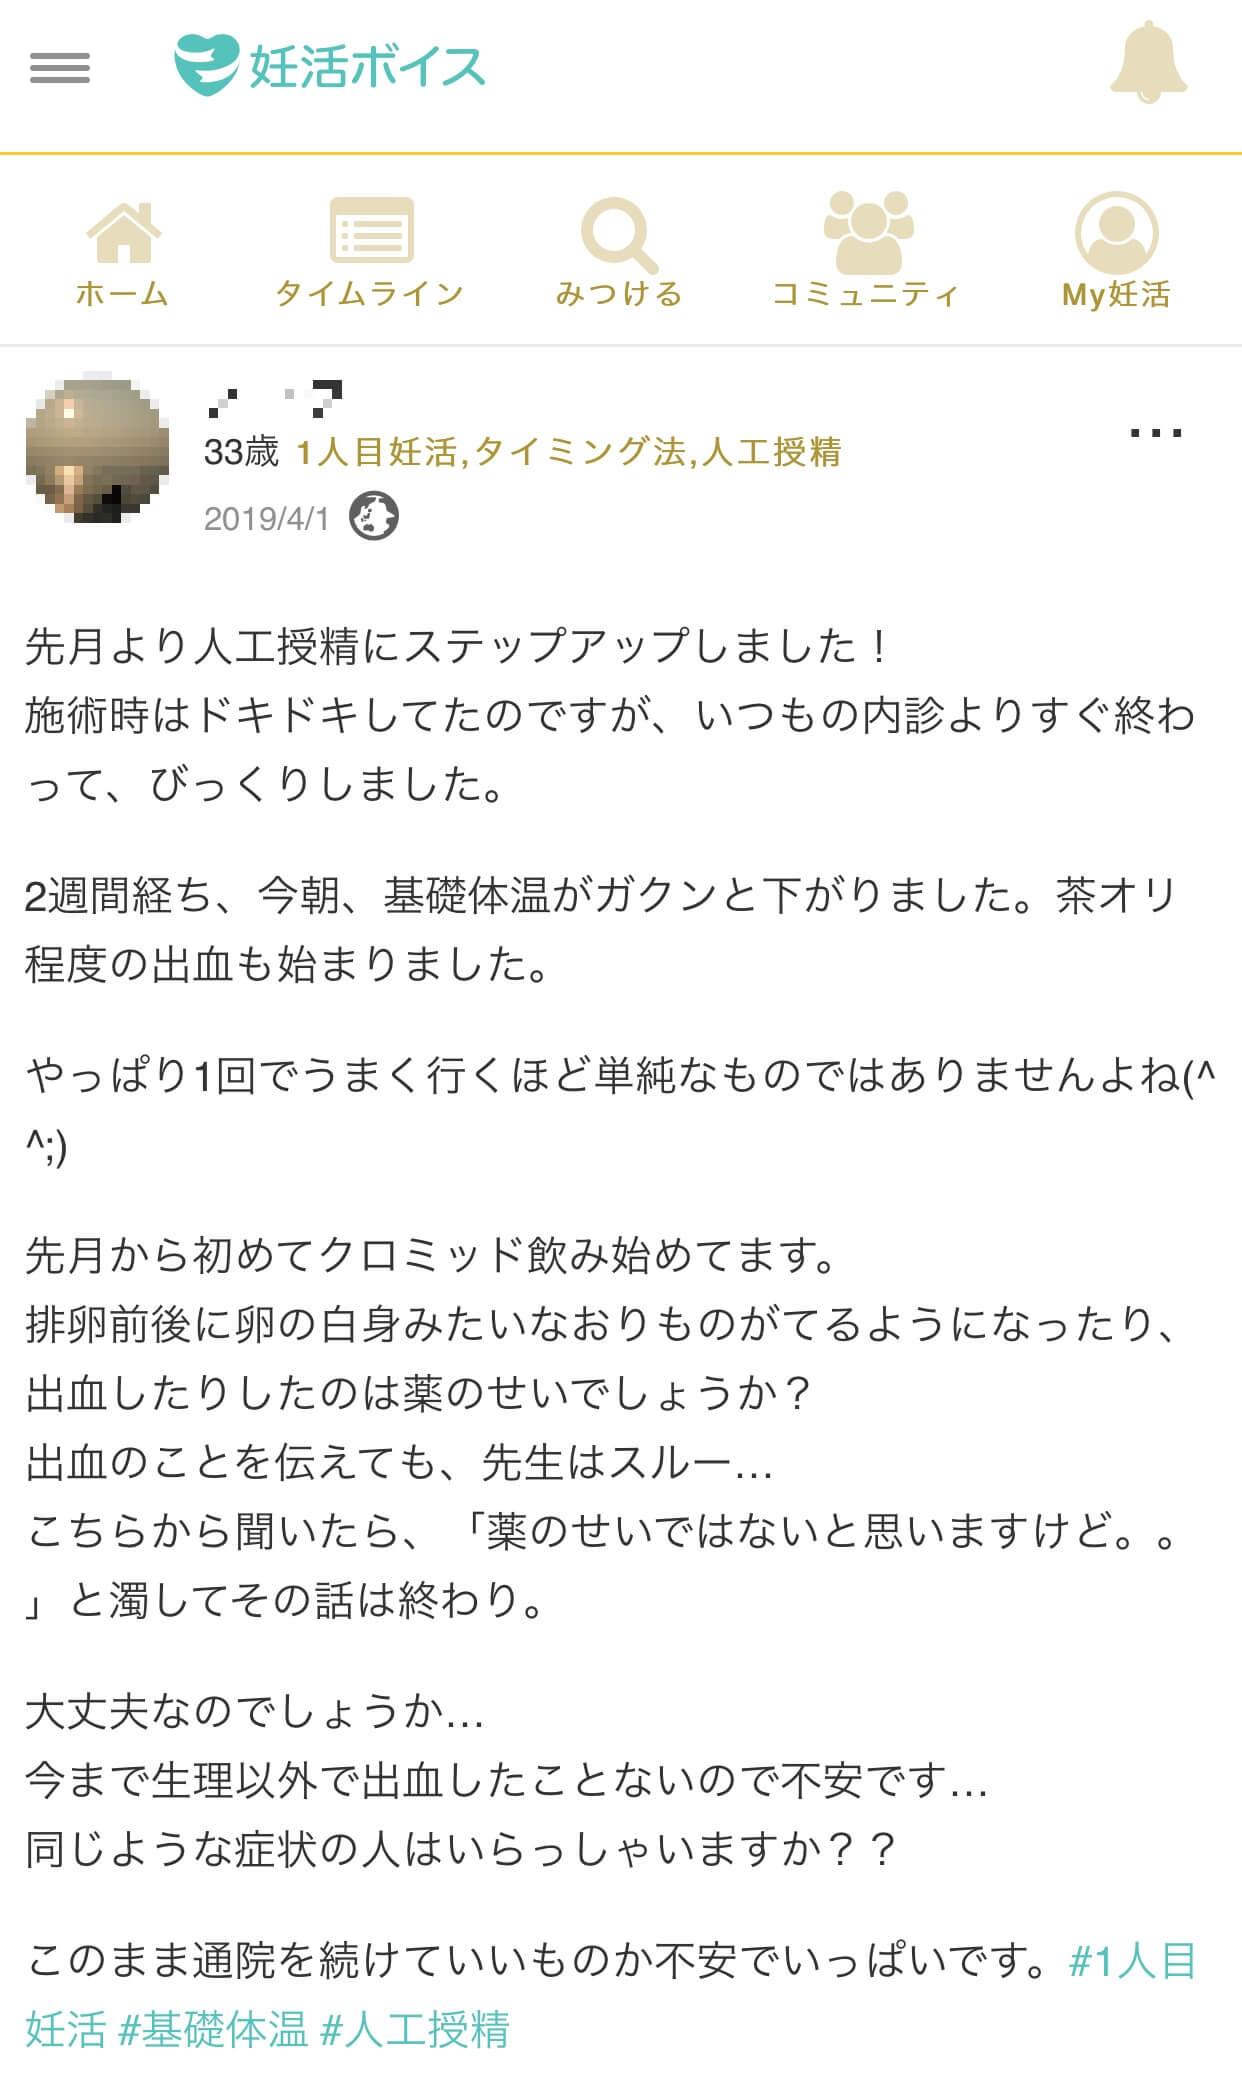 Noさん(33歳・1人目妊活・タイミング法・人工授精)